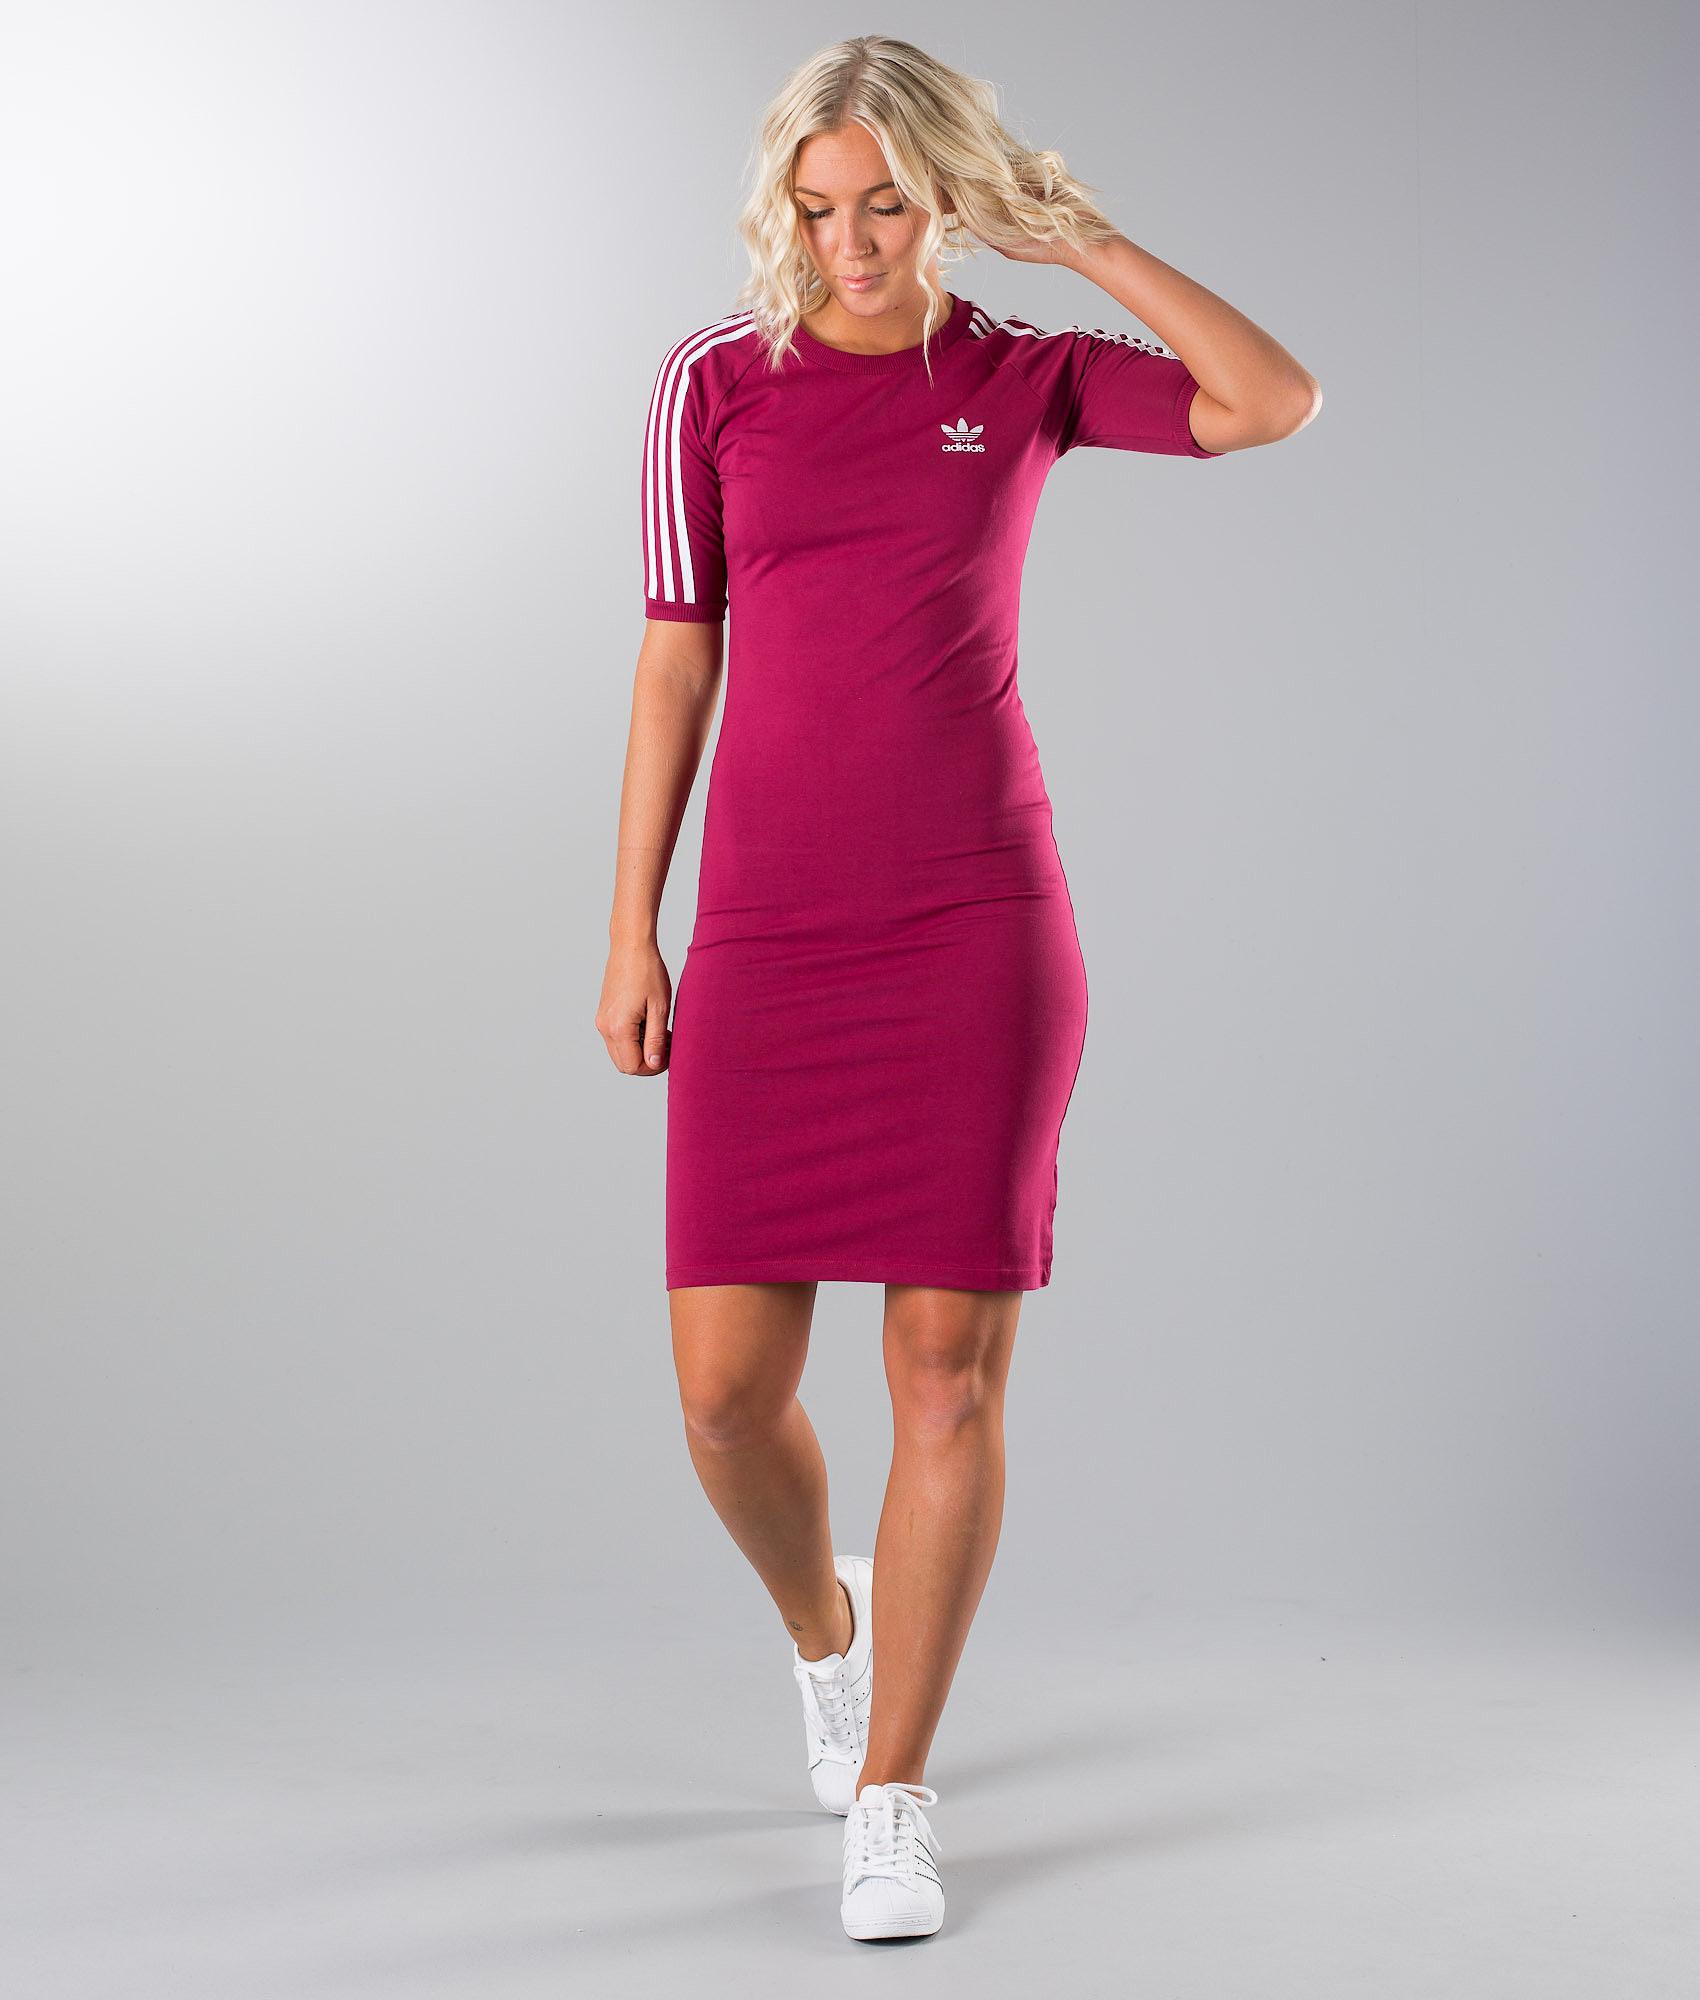 1ed0f8035bb Adidas Originals 3 Stripes Dress Dress Mystery Ruby F17 - Ridestore.com